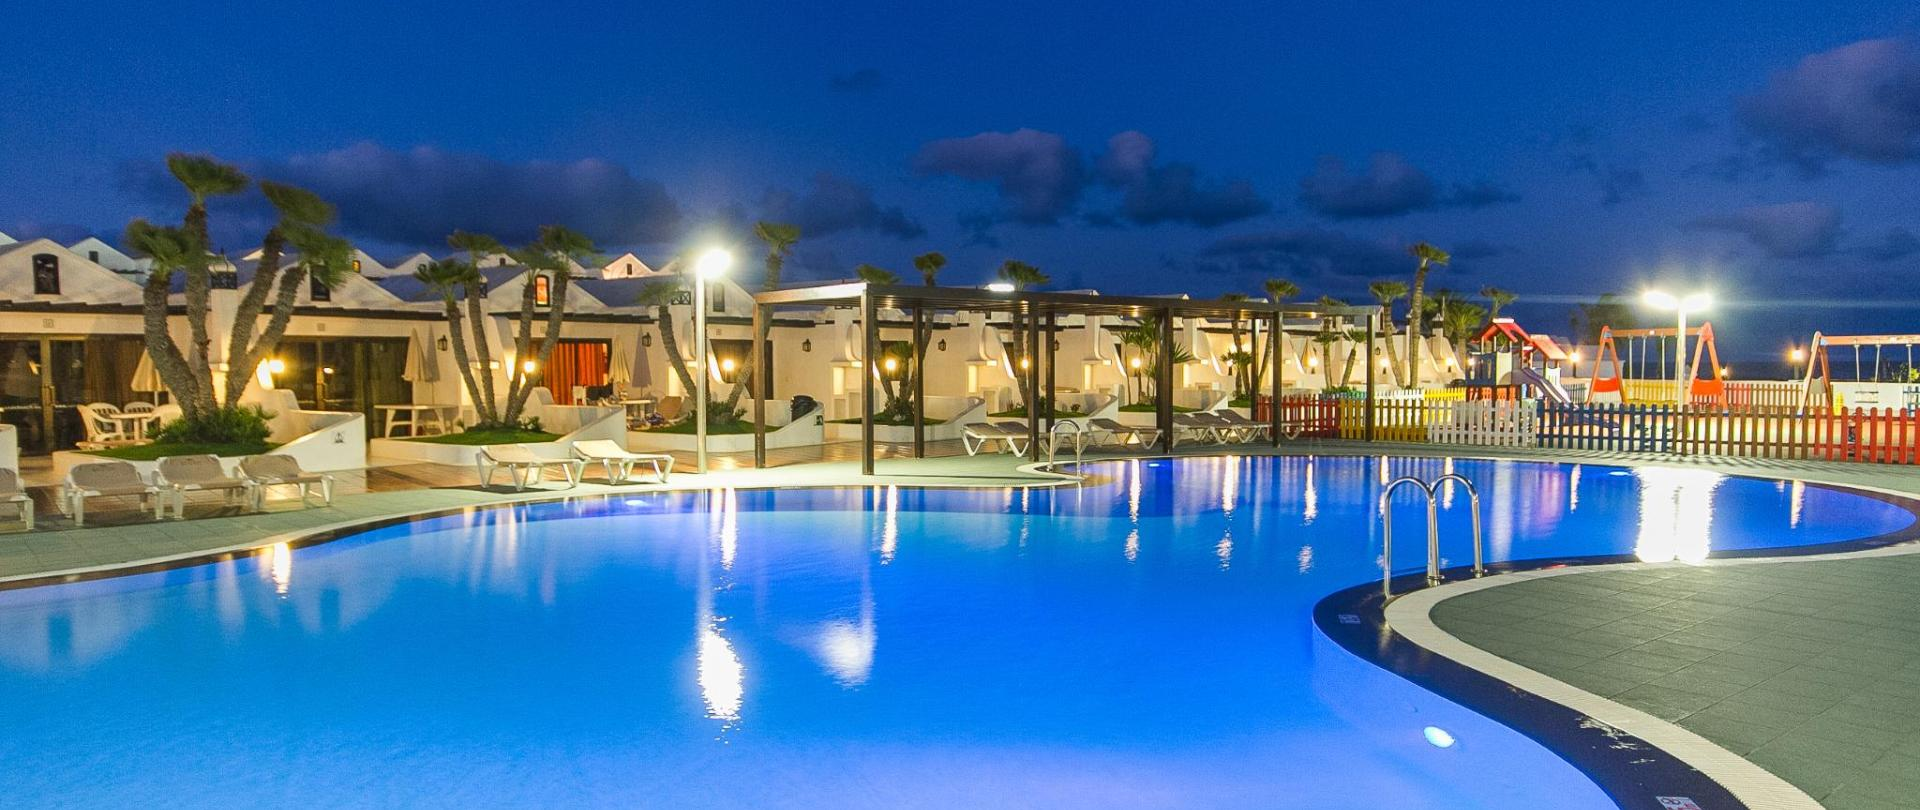 Beautiful night at Sands Beach Resort.jpg